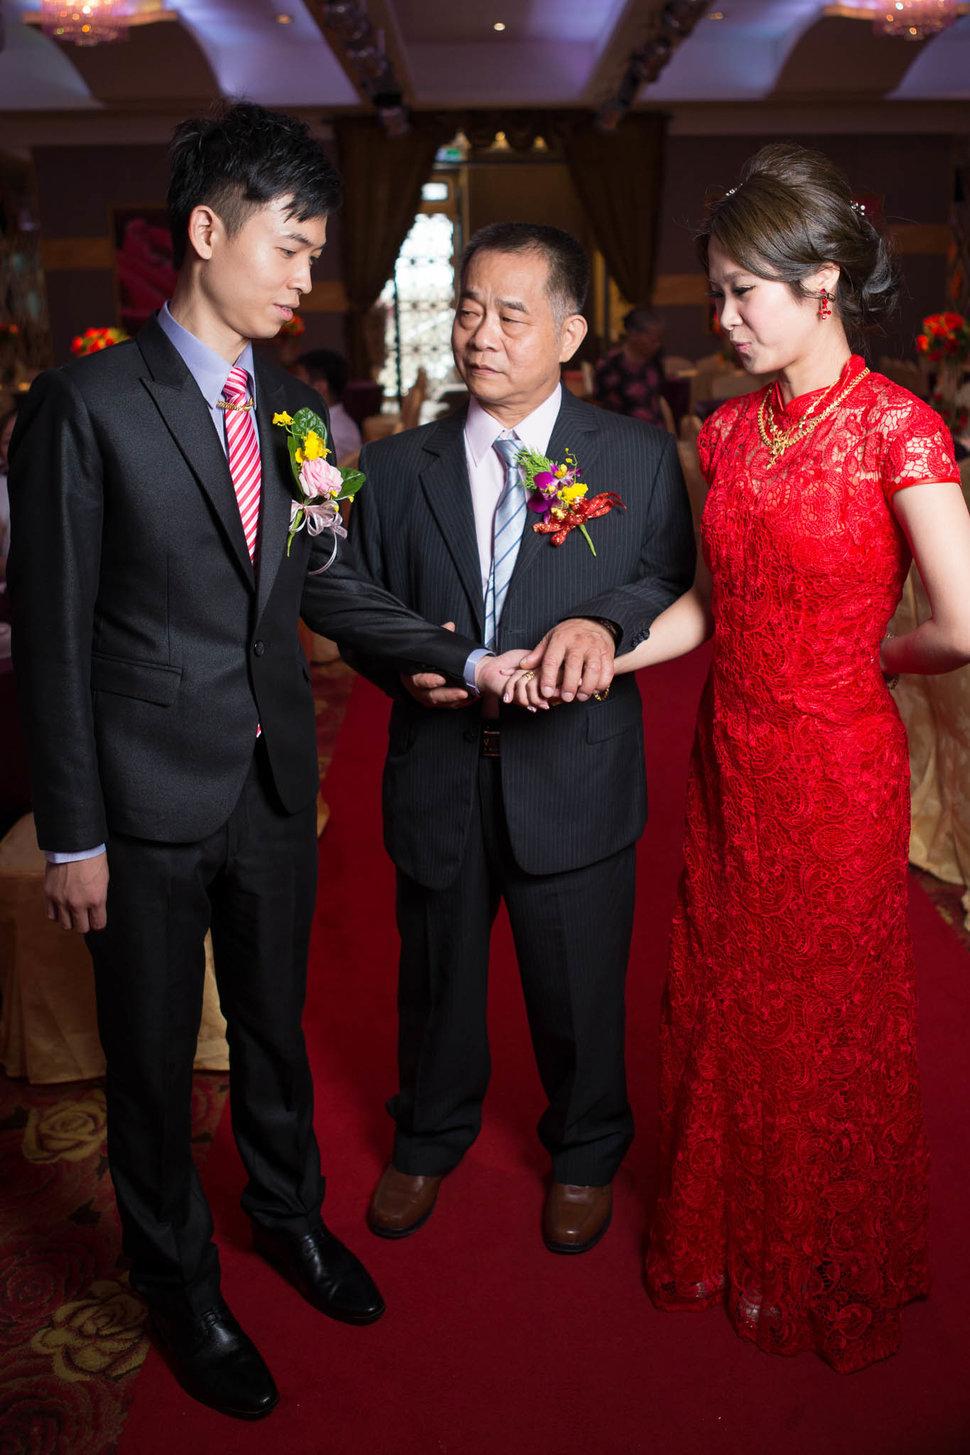 18PHOTO-TIM❤️ ROSA(編號:220642) - 18PHOTO 婚紗影像攝影工作室 - 結婚吧一站式婚禮服務平台